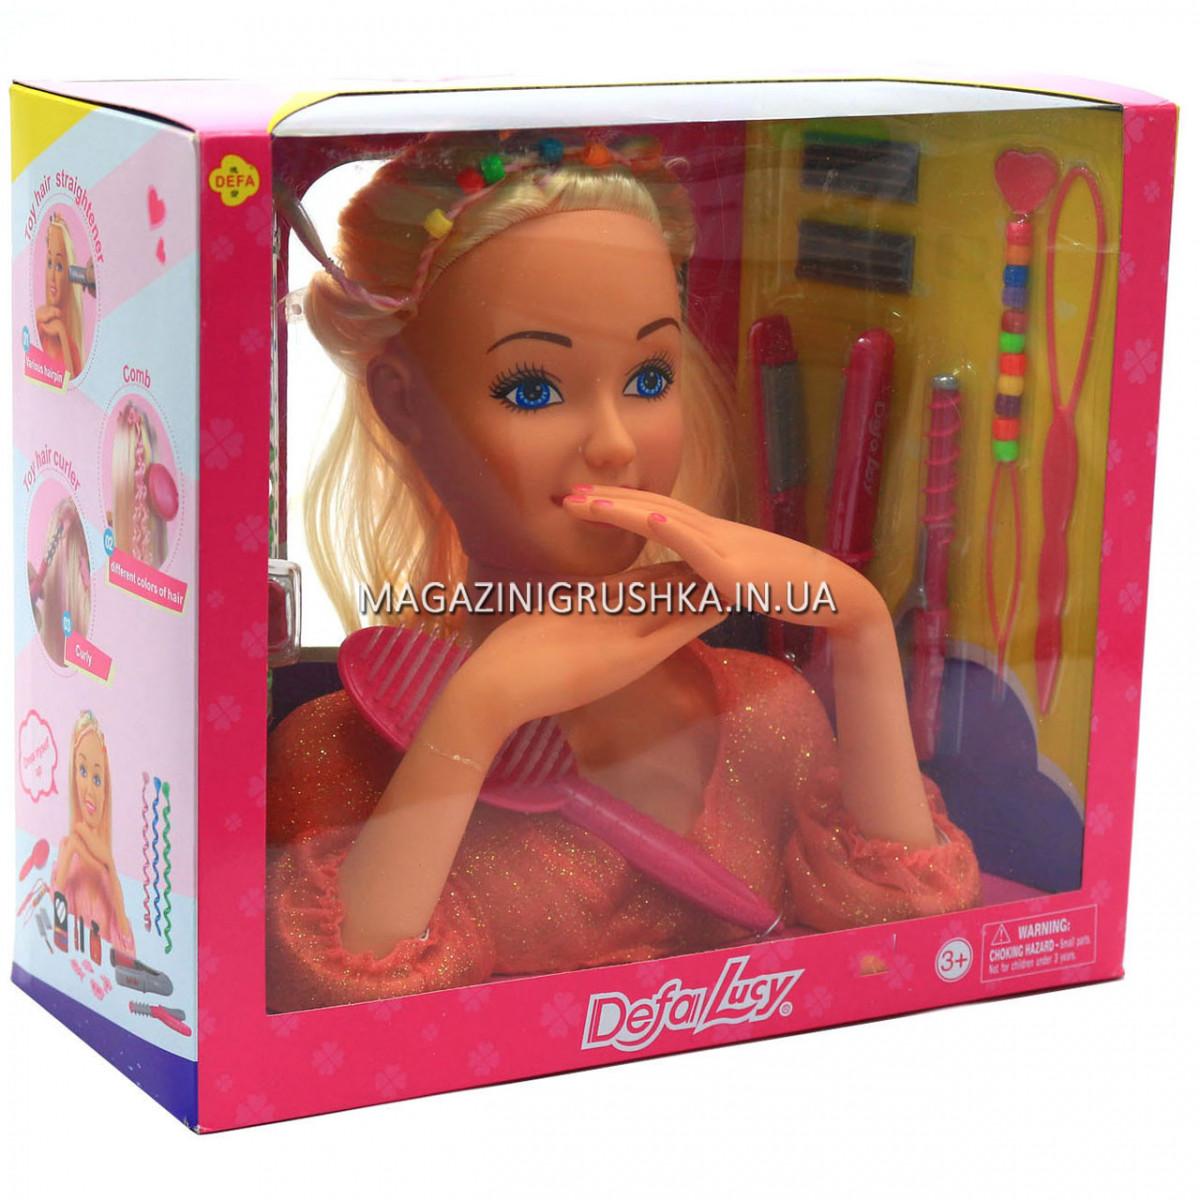 Кукла для причесок «Defa Lucy» (голова куклы), косметика, аксессуары 23 см (8415)